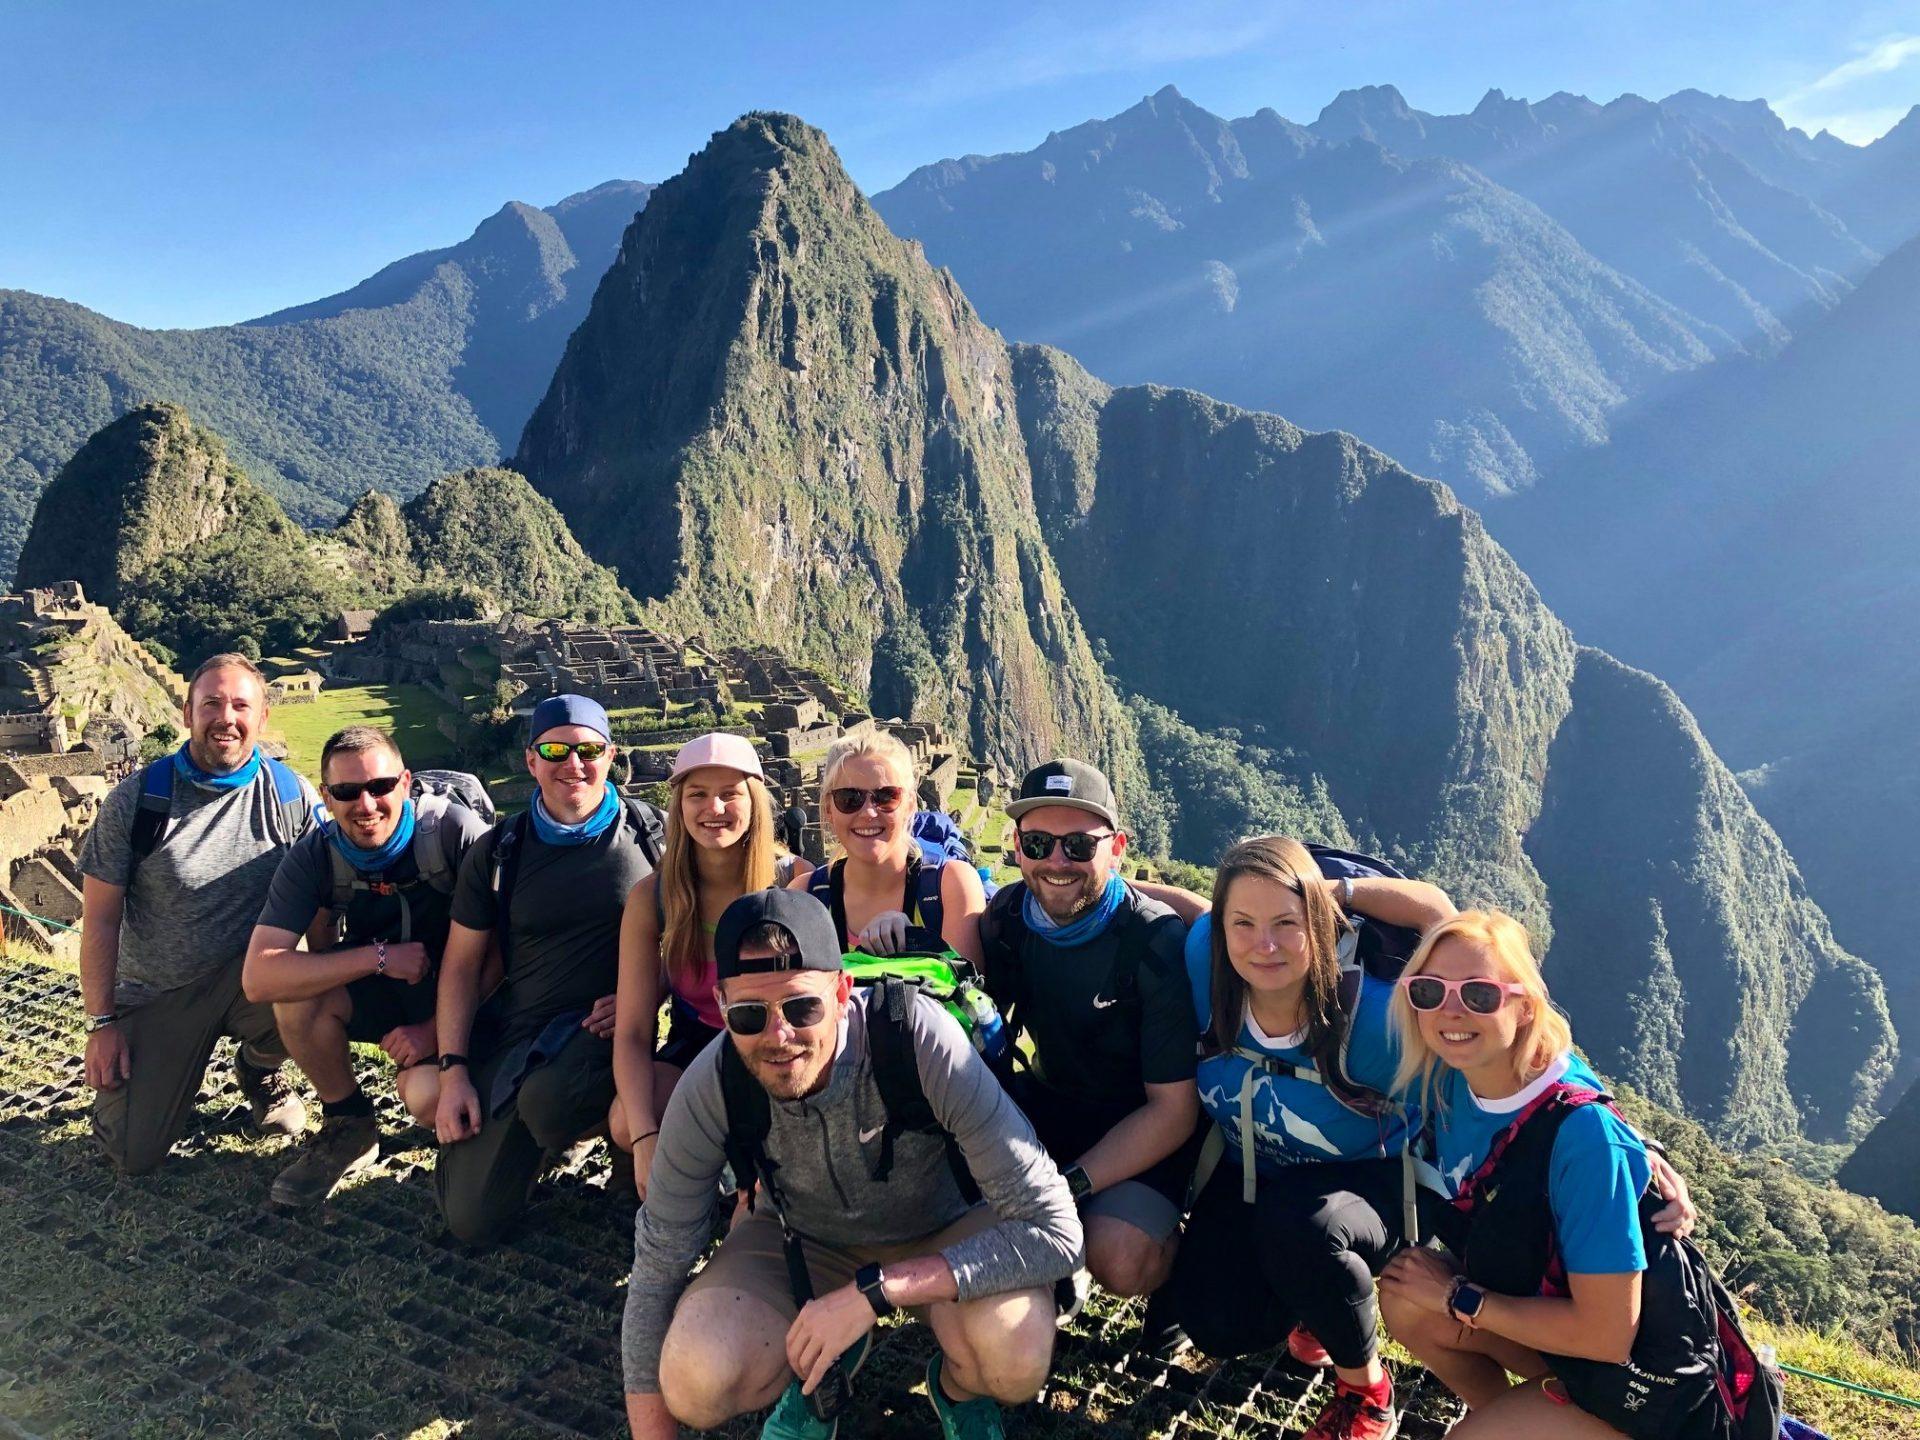 Bucket List Company group in Machu Picchu